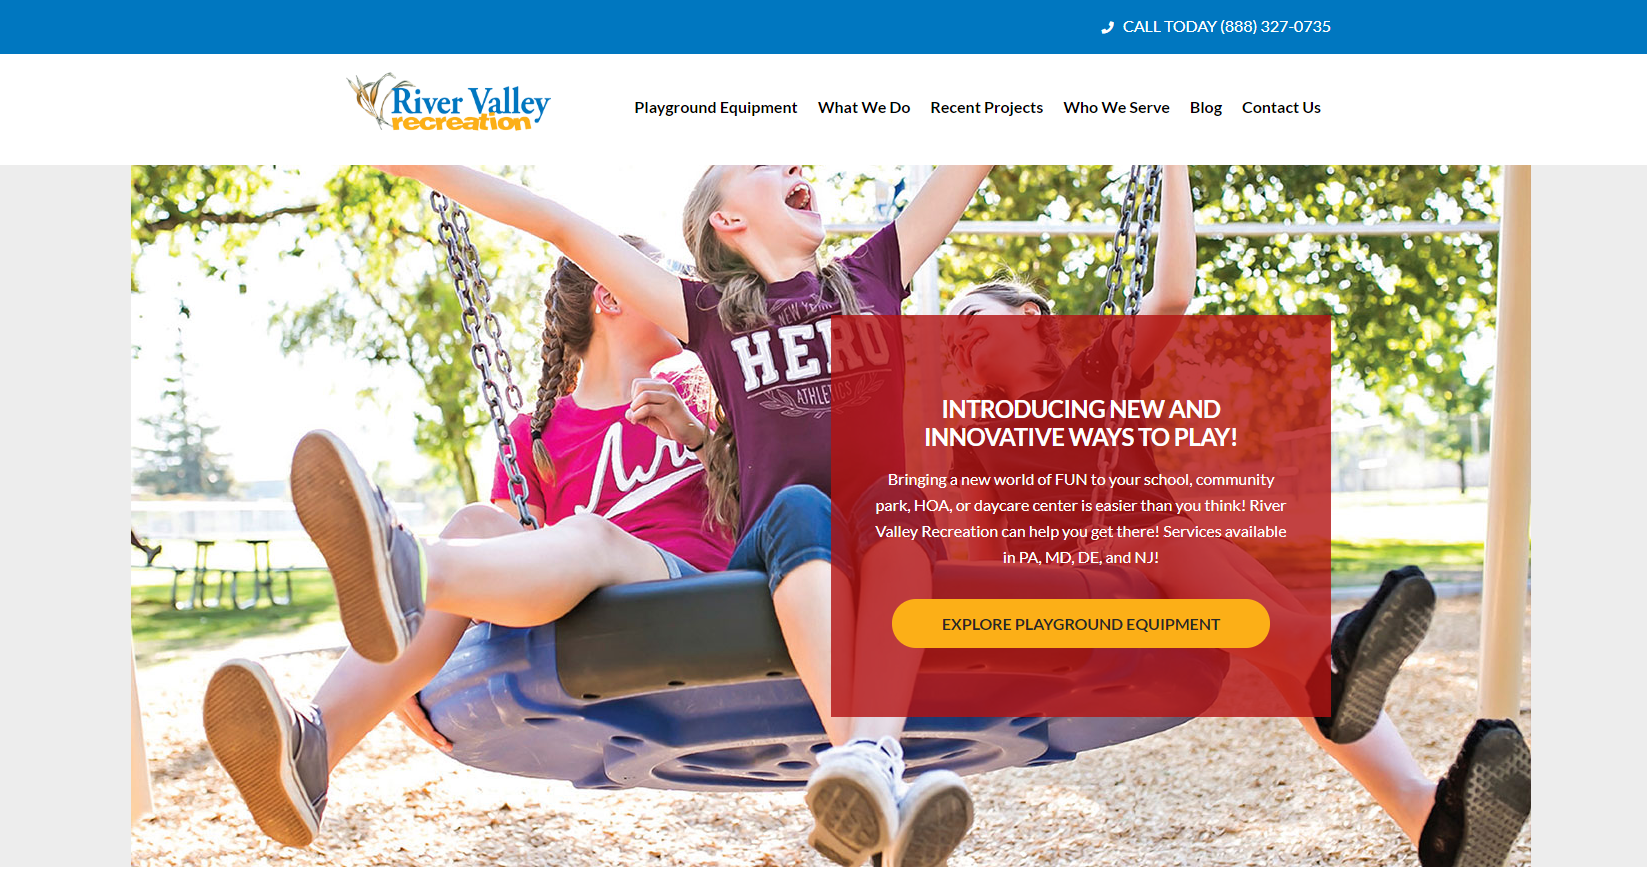 River Valley Recreation Homepage Screenshot